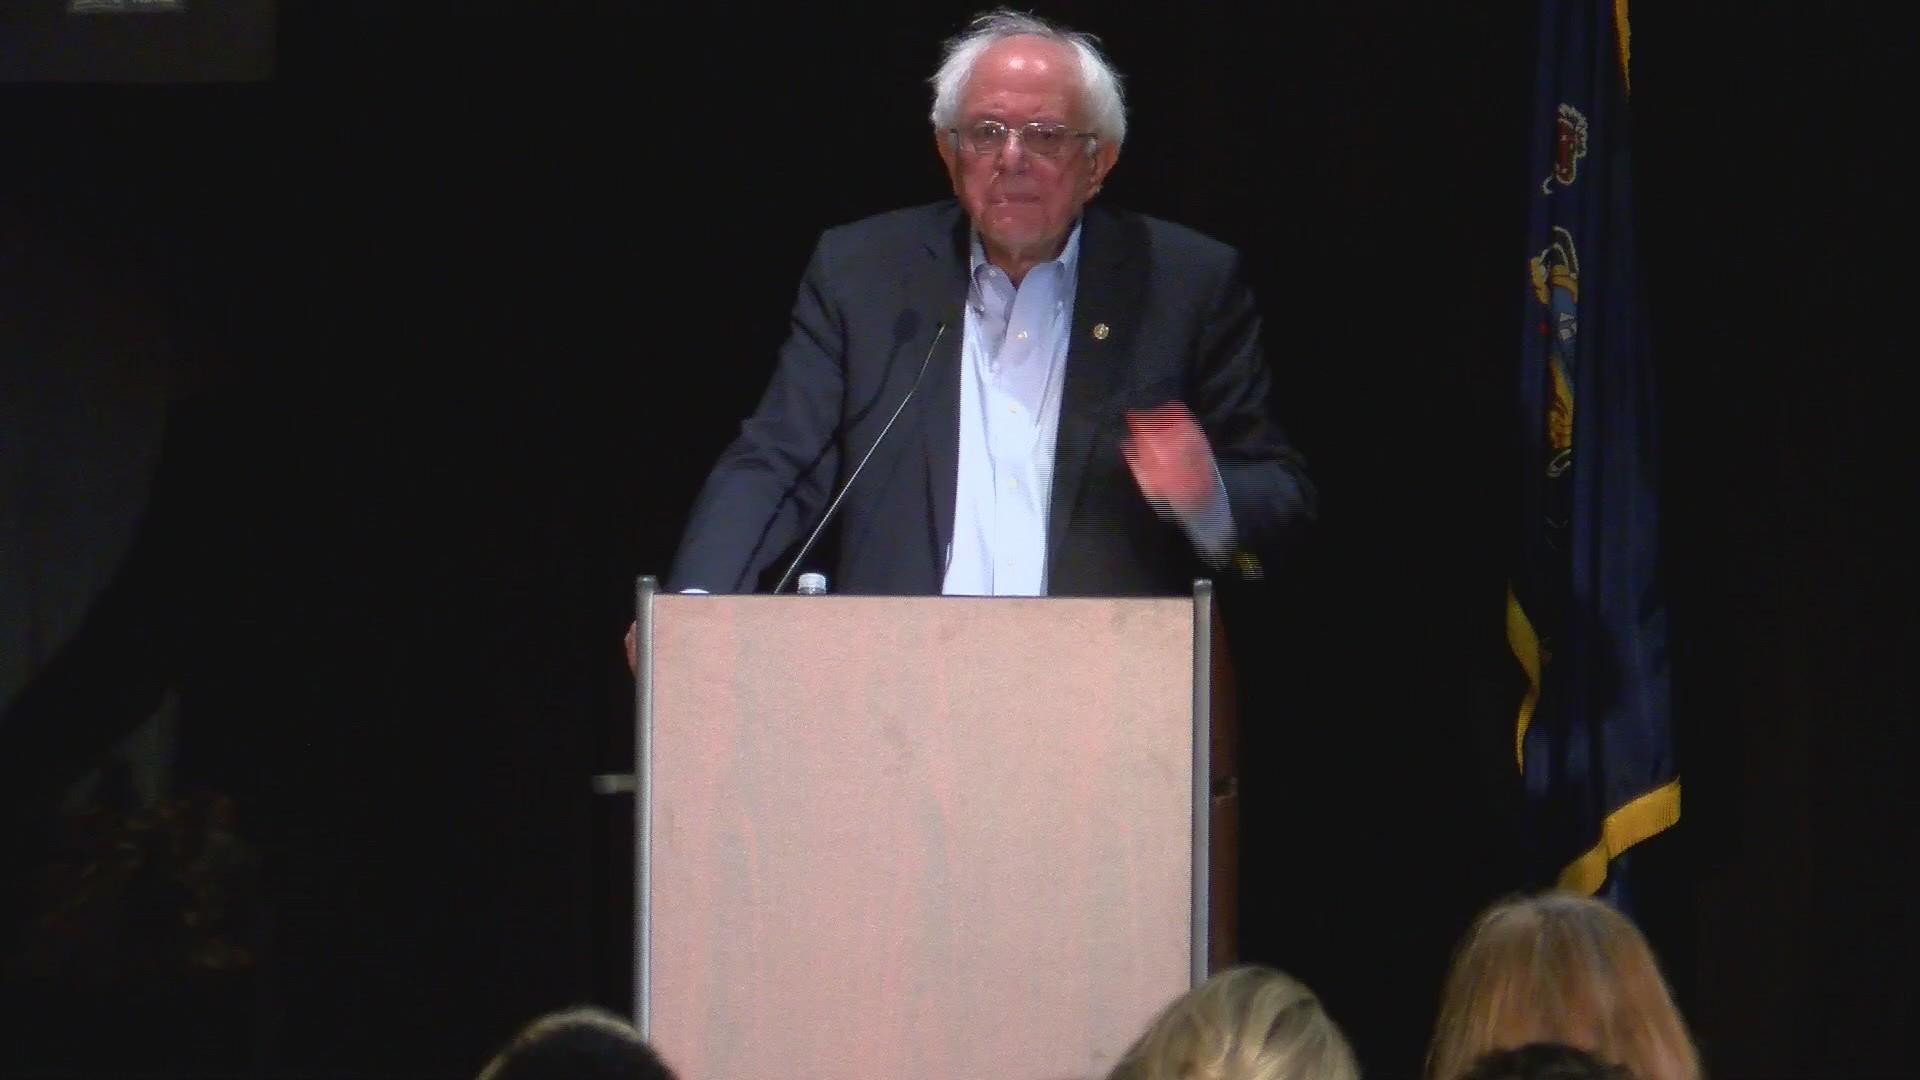 Bernie_Sanders_stops_in_Luzerne_County_0_20190415214717